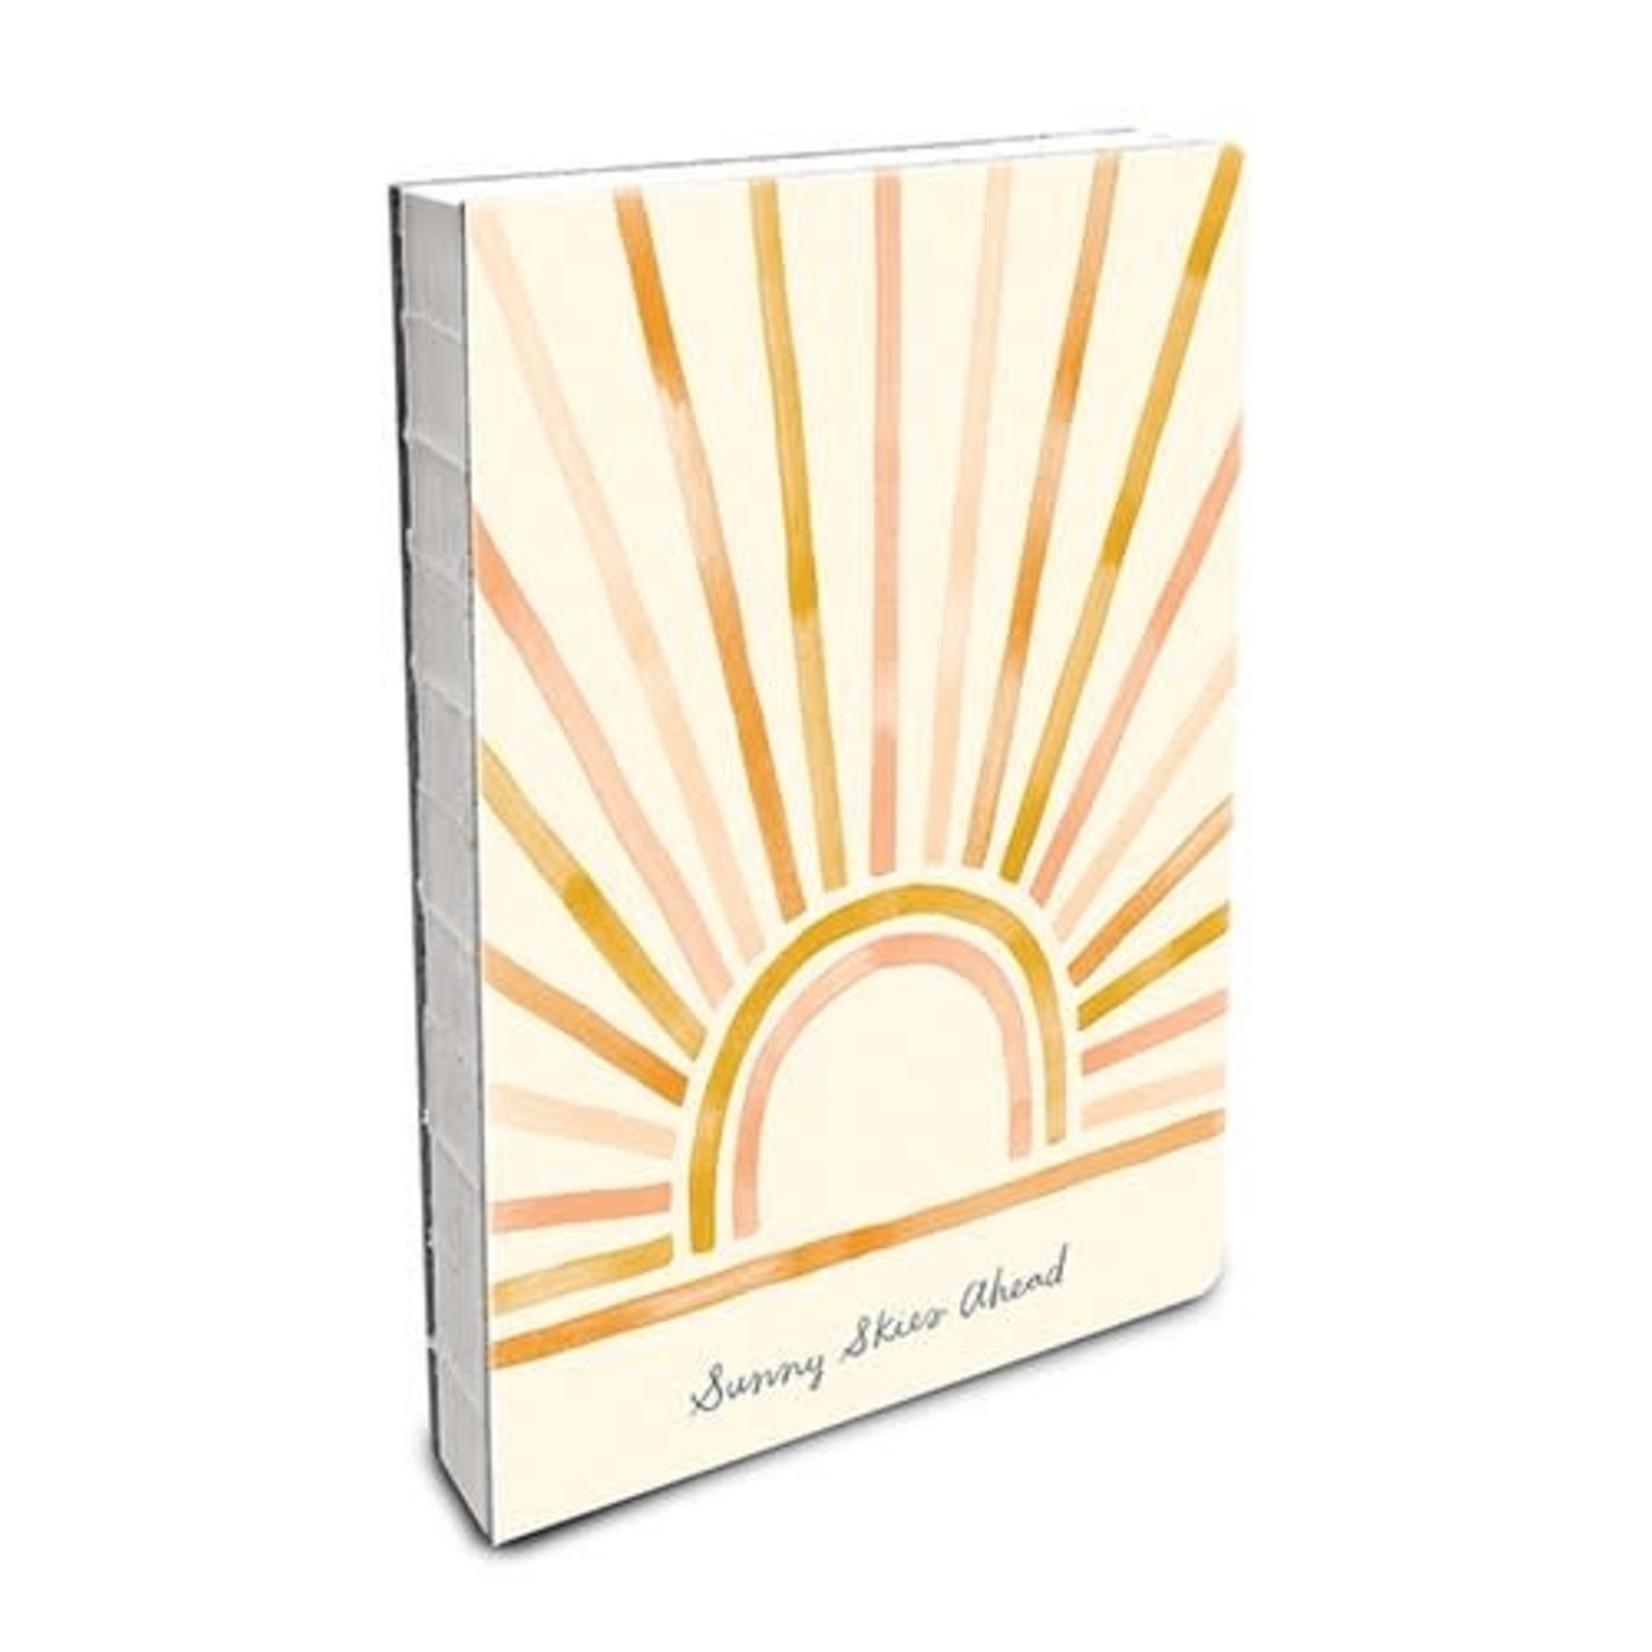 Orange Circle Studio Sunny Skies Ahead Notebook